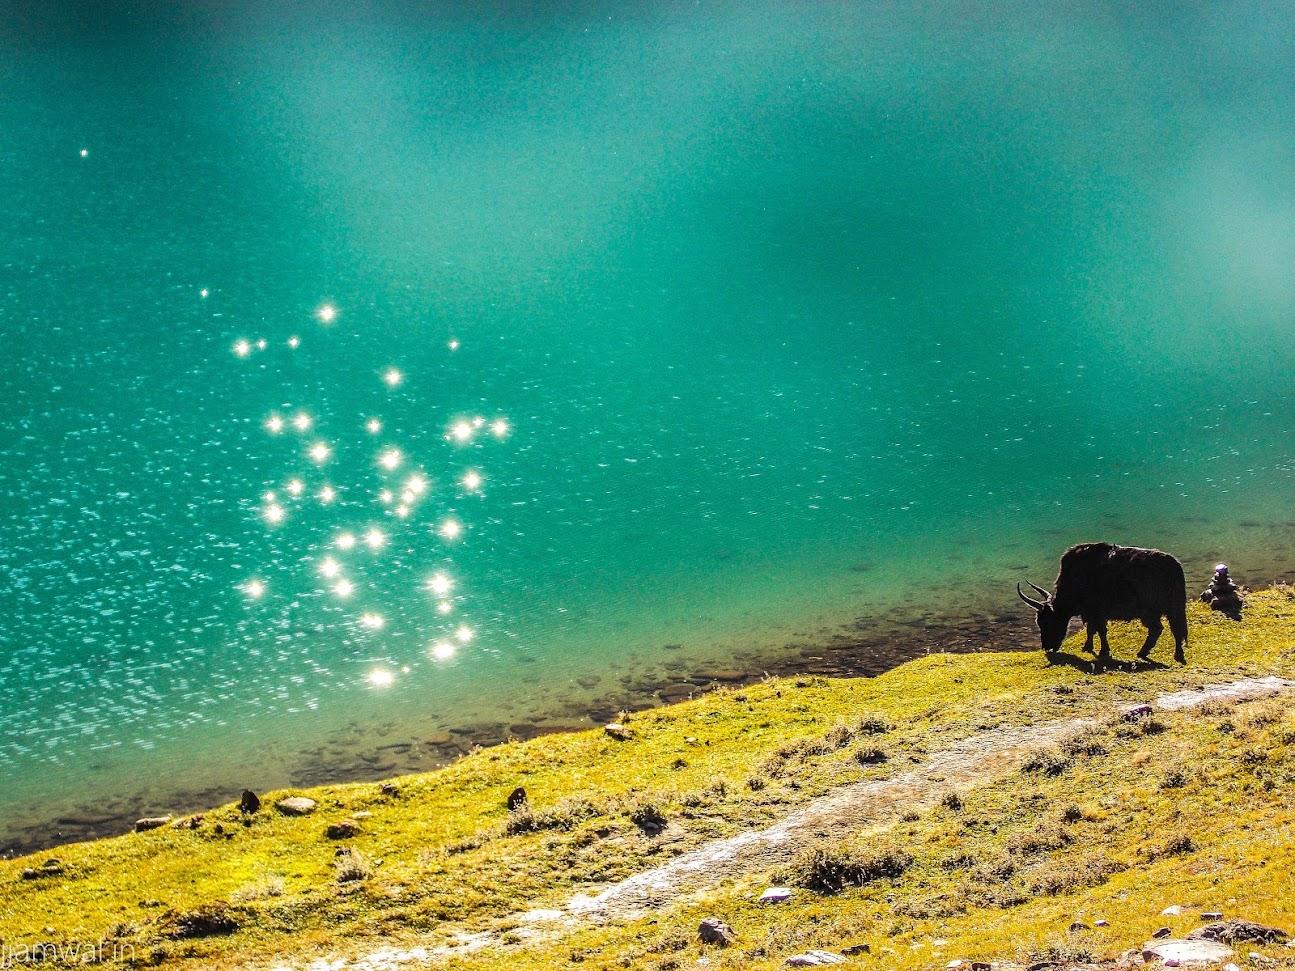 A yak grazing near chandrataal lake